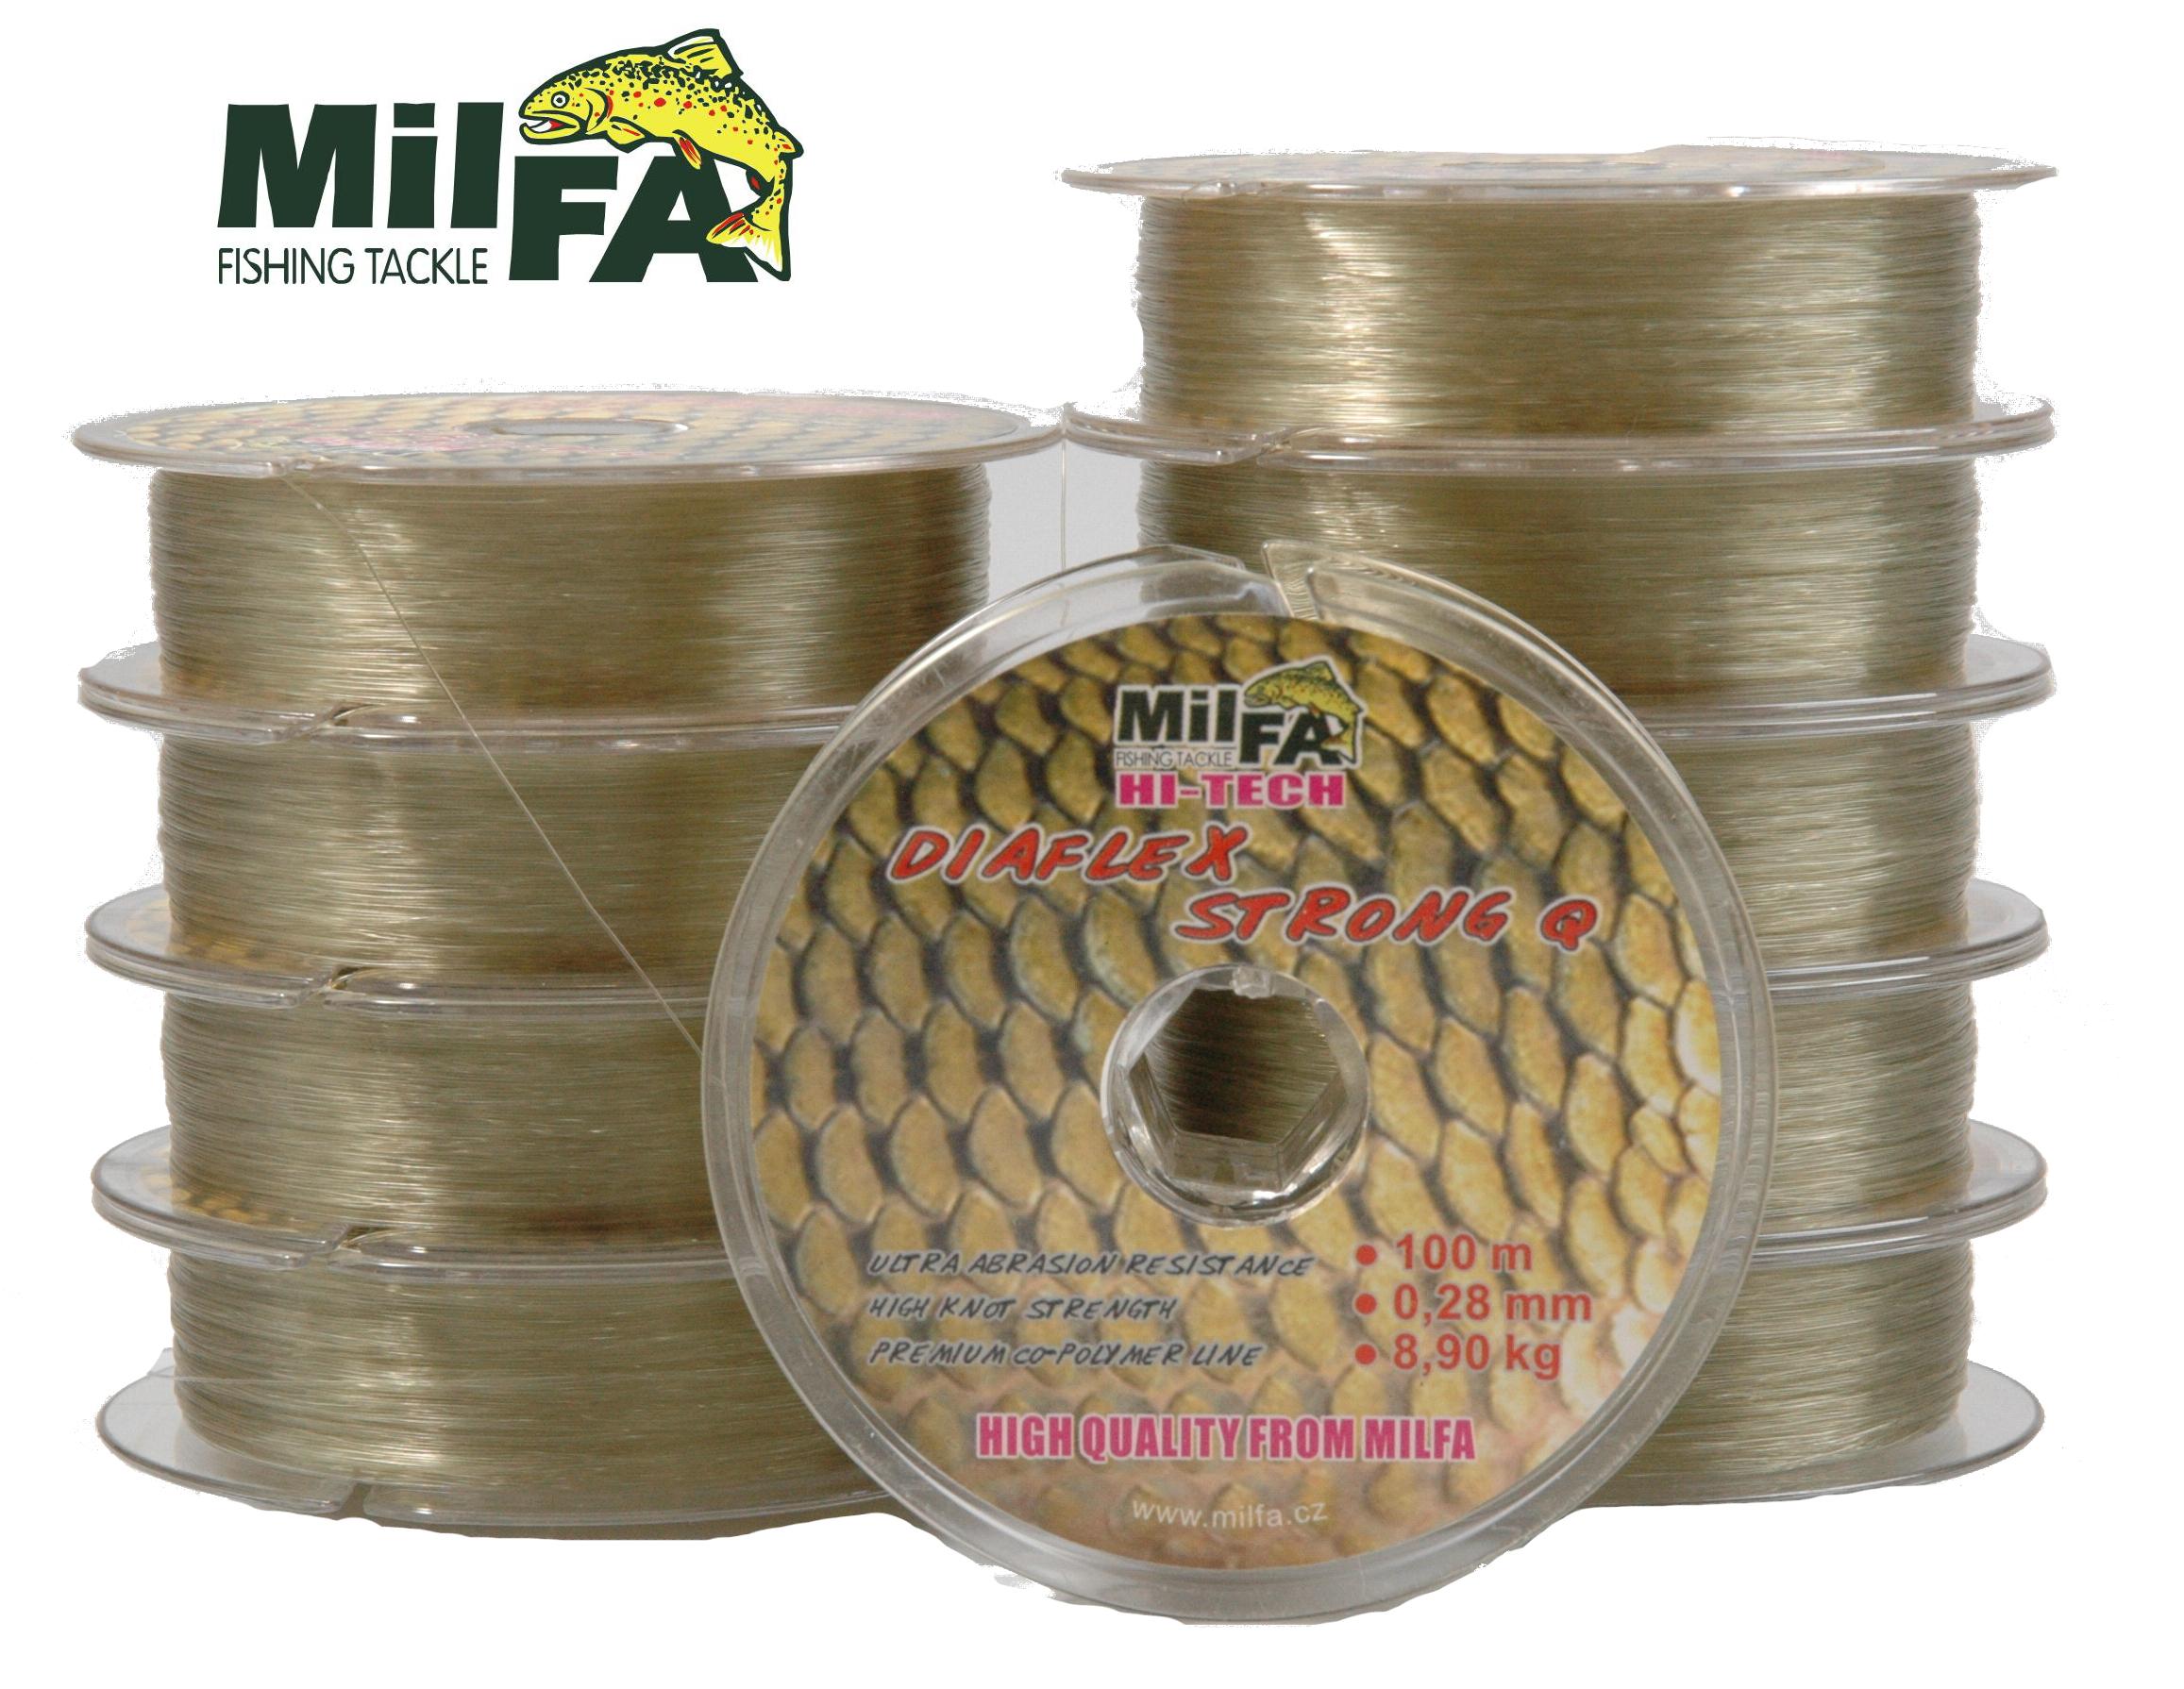 Milfa Diaflex Strong Q 0,28mm